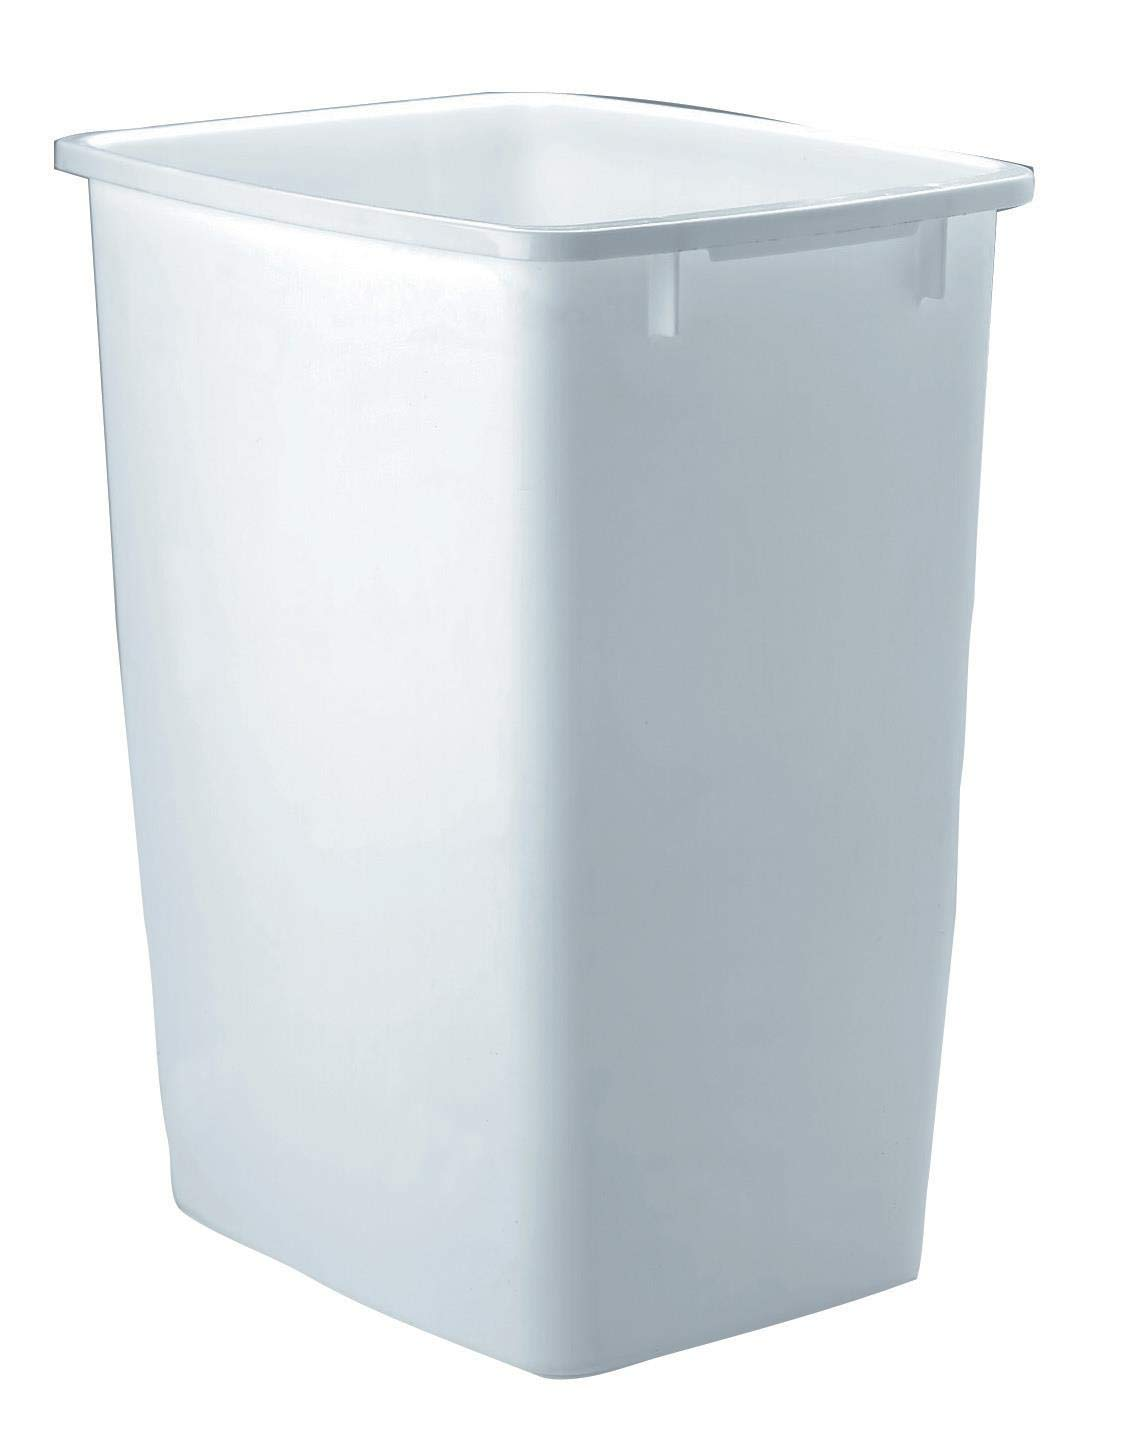 Rubbermaid Wastebasket 36 Quart, White